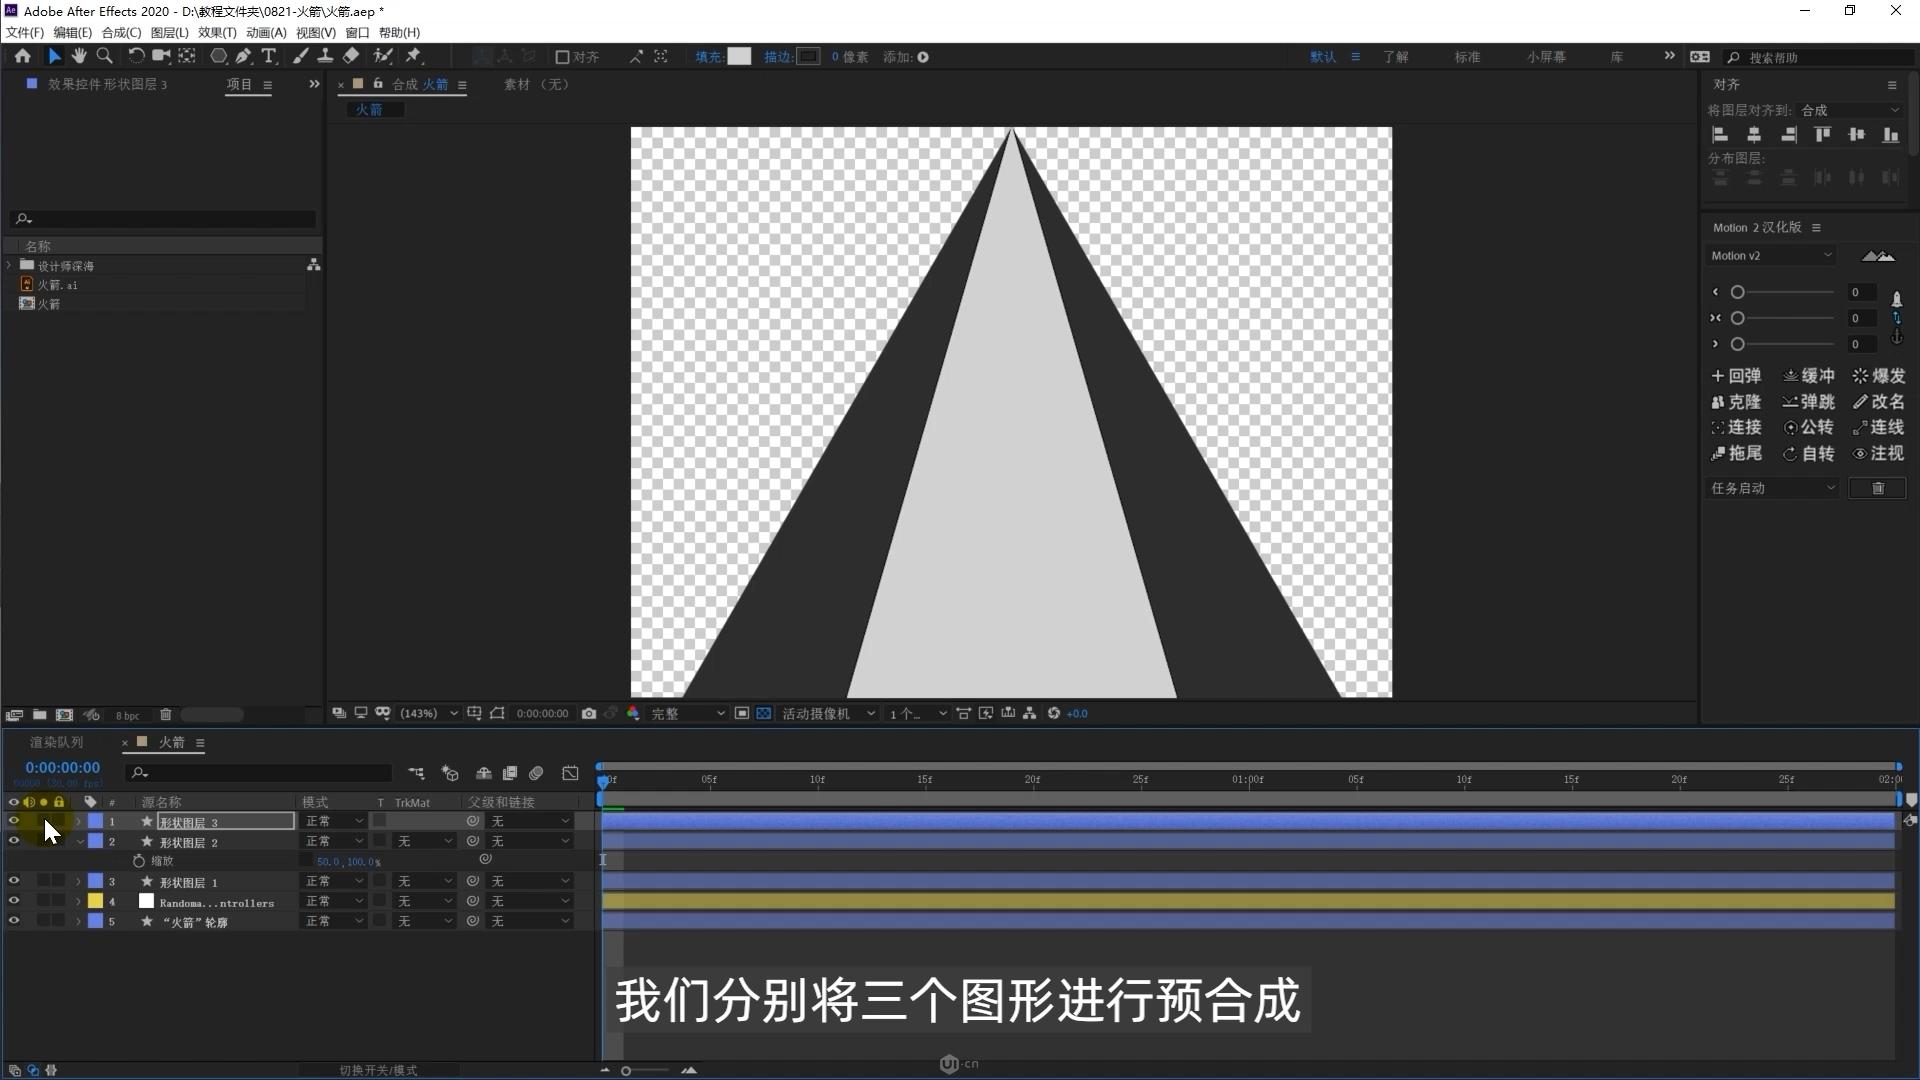 AE如何制作简单的太空旅行MG动画(6)